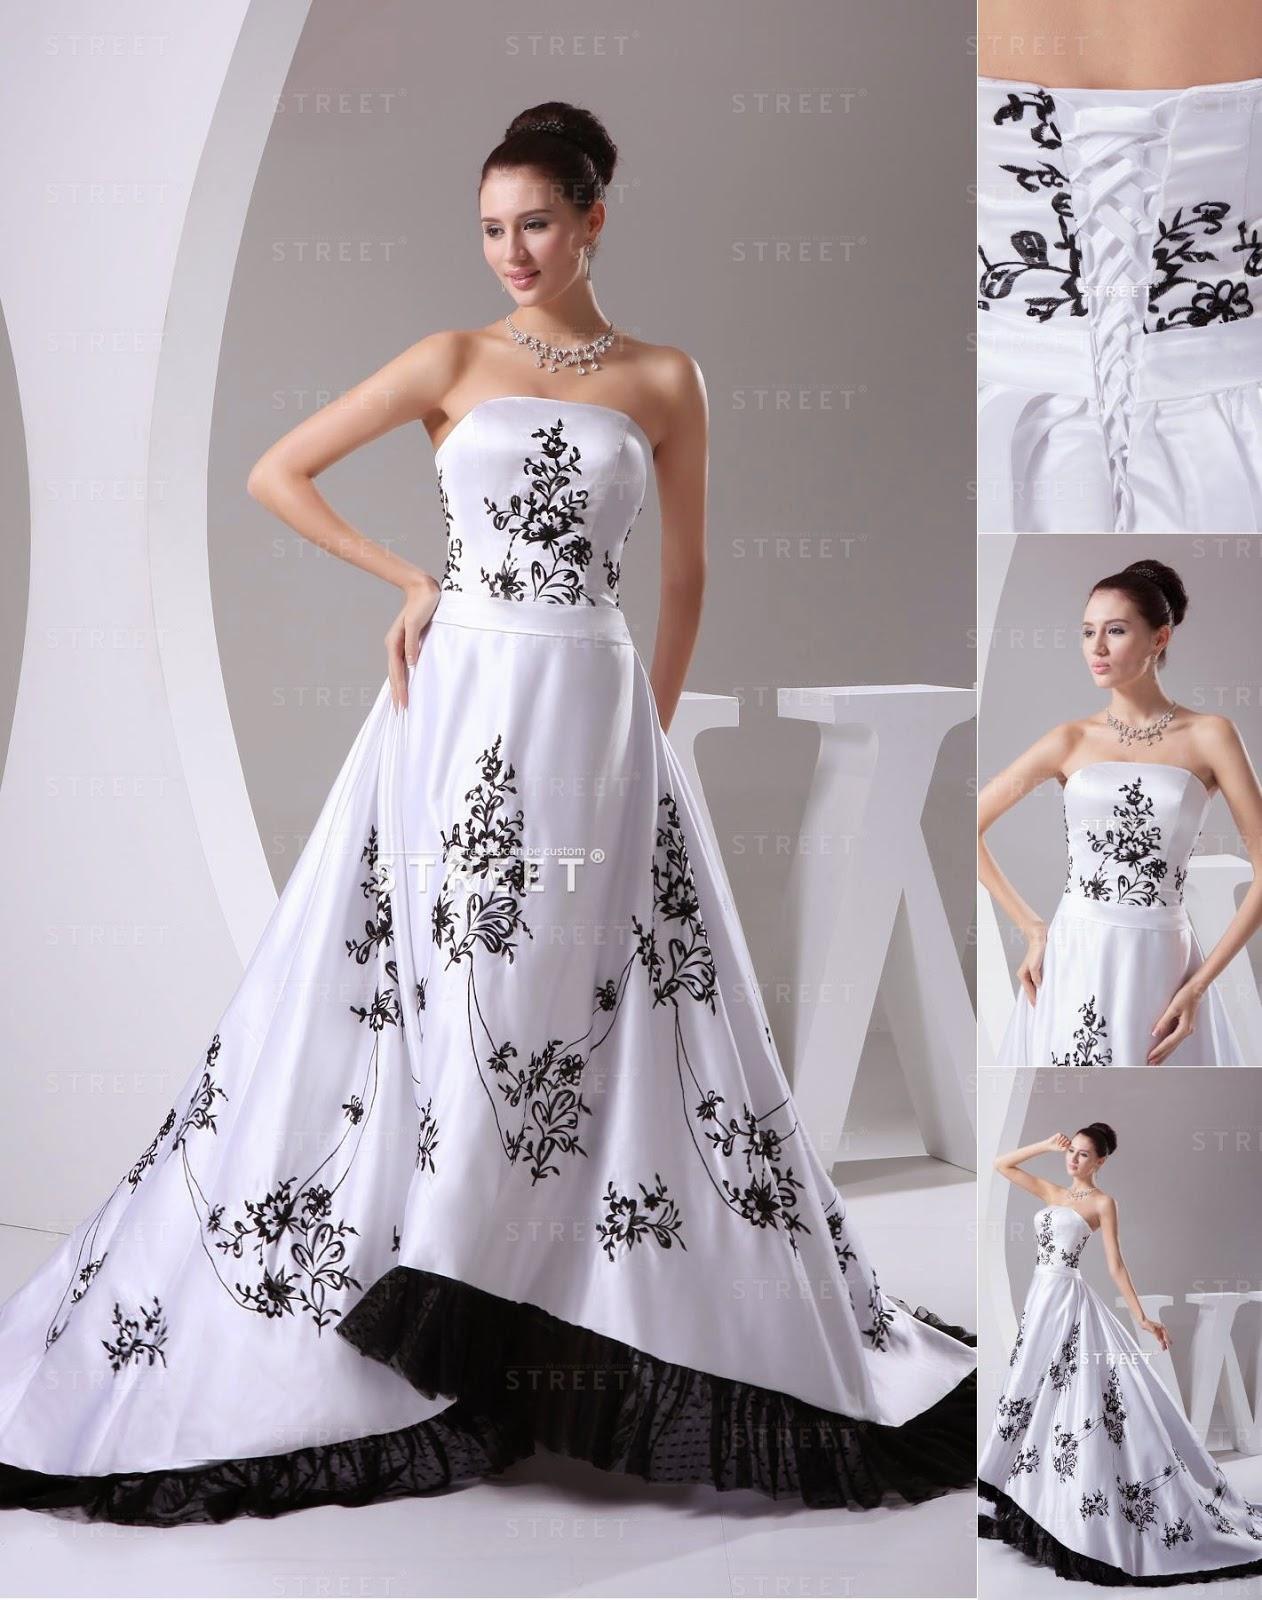 Provato per voi e noi dress street and its fabulous for Destination plus size wedding dresses